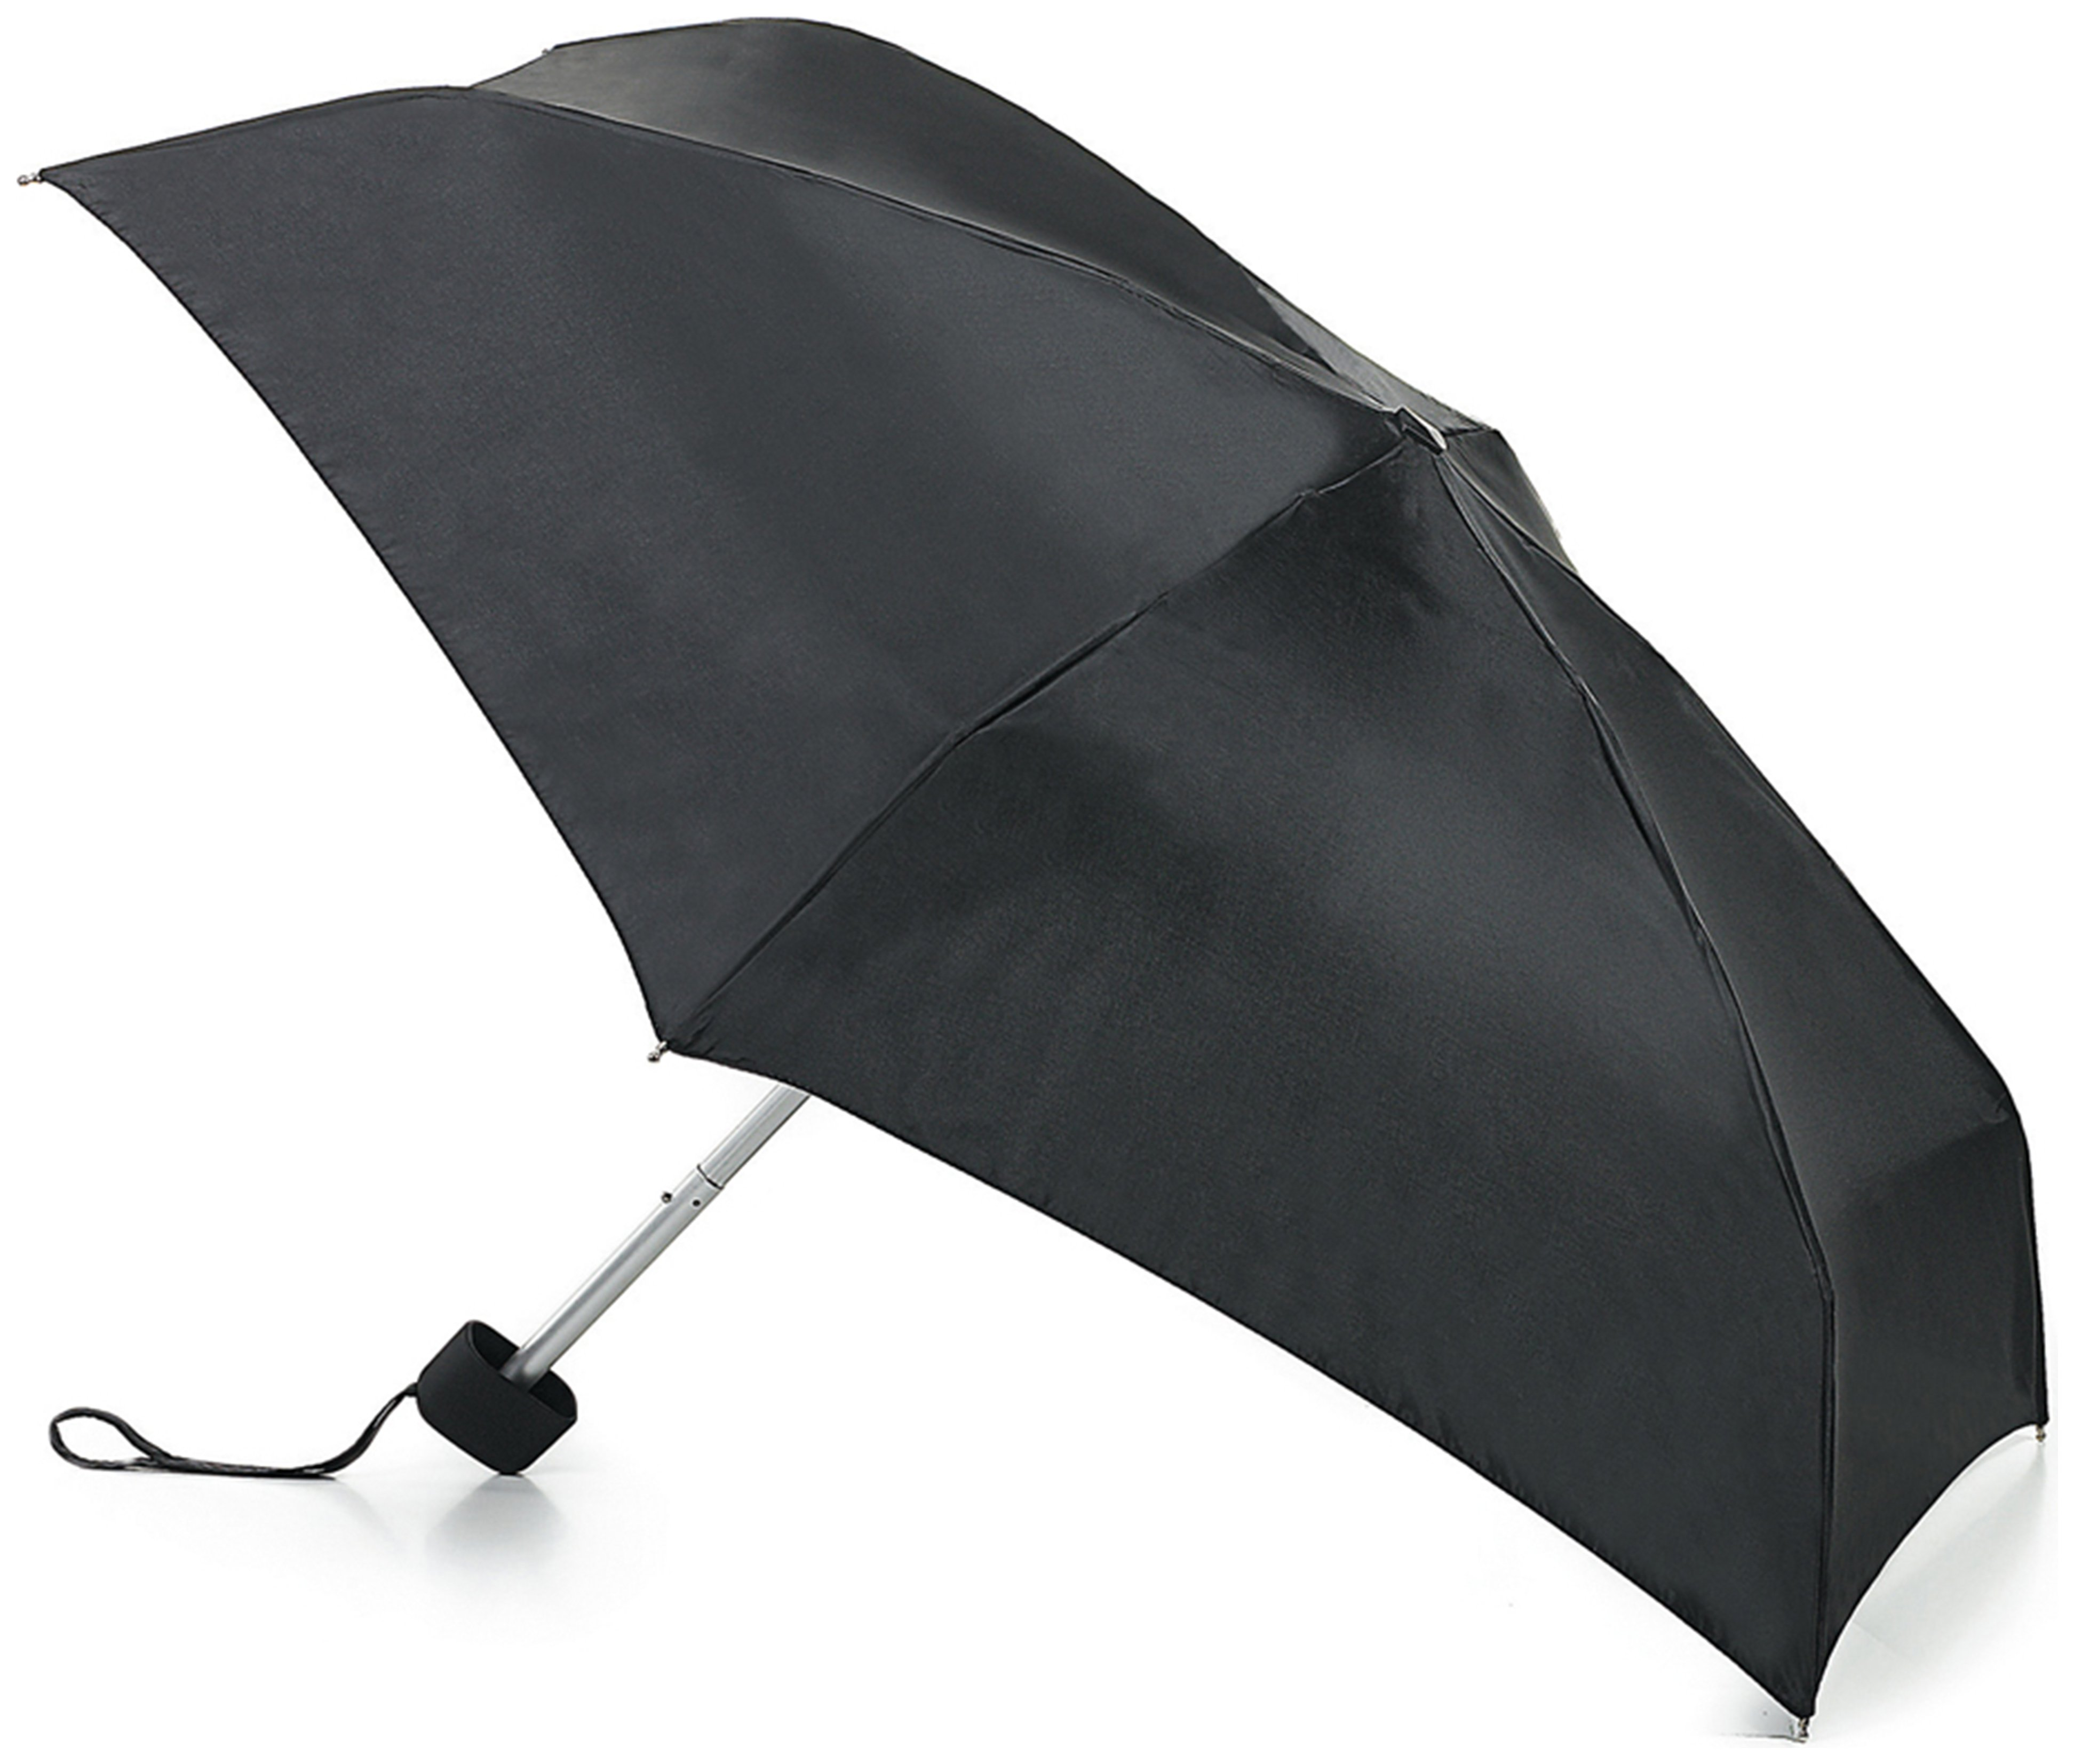 Fulton Tiny 1 Umbrella - Black